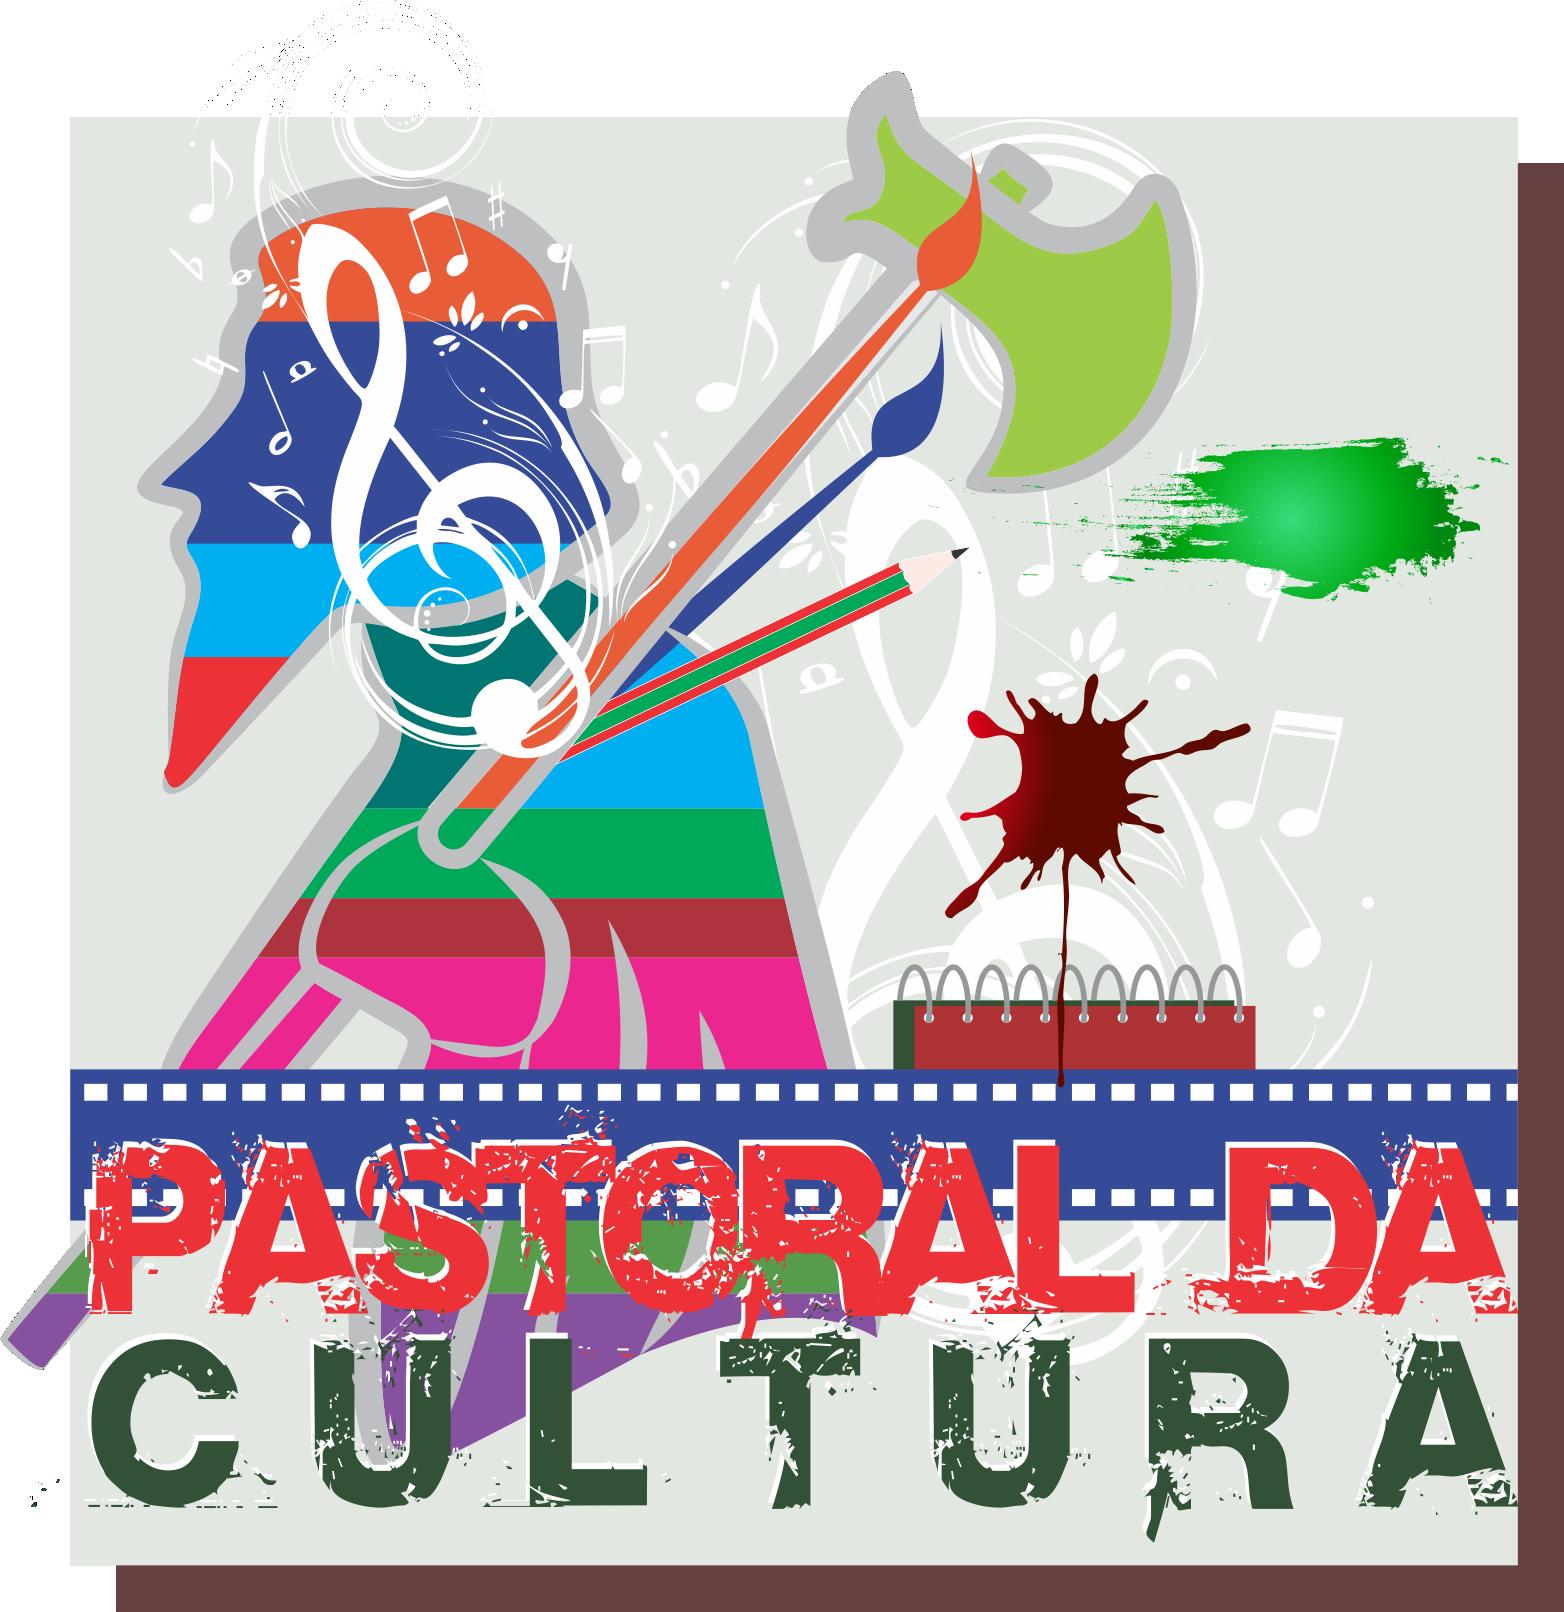 Pastoral da Cultura_logo